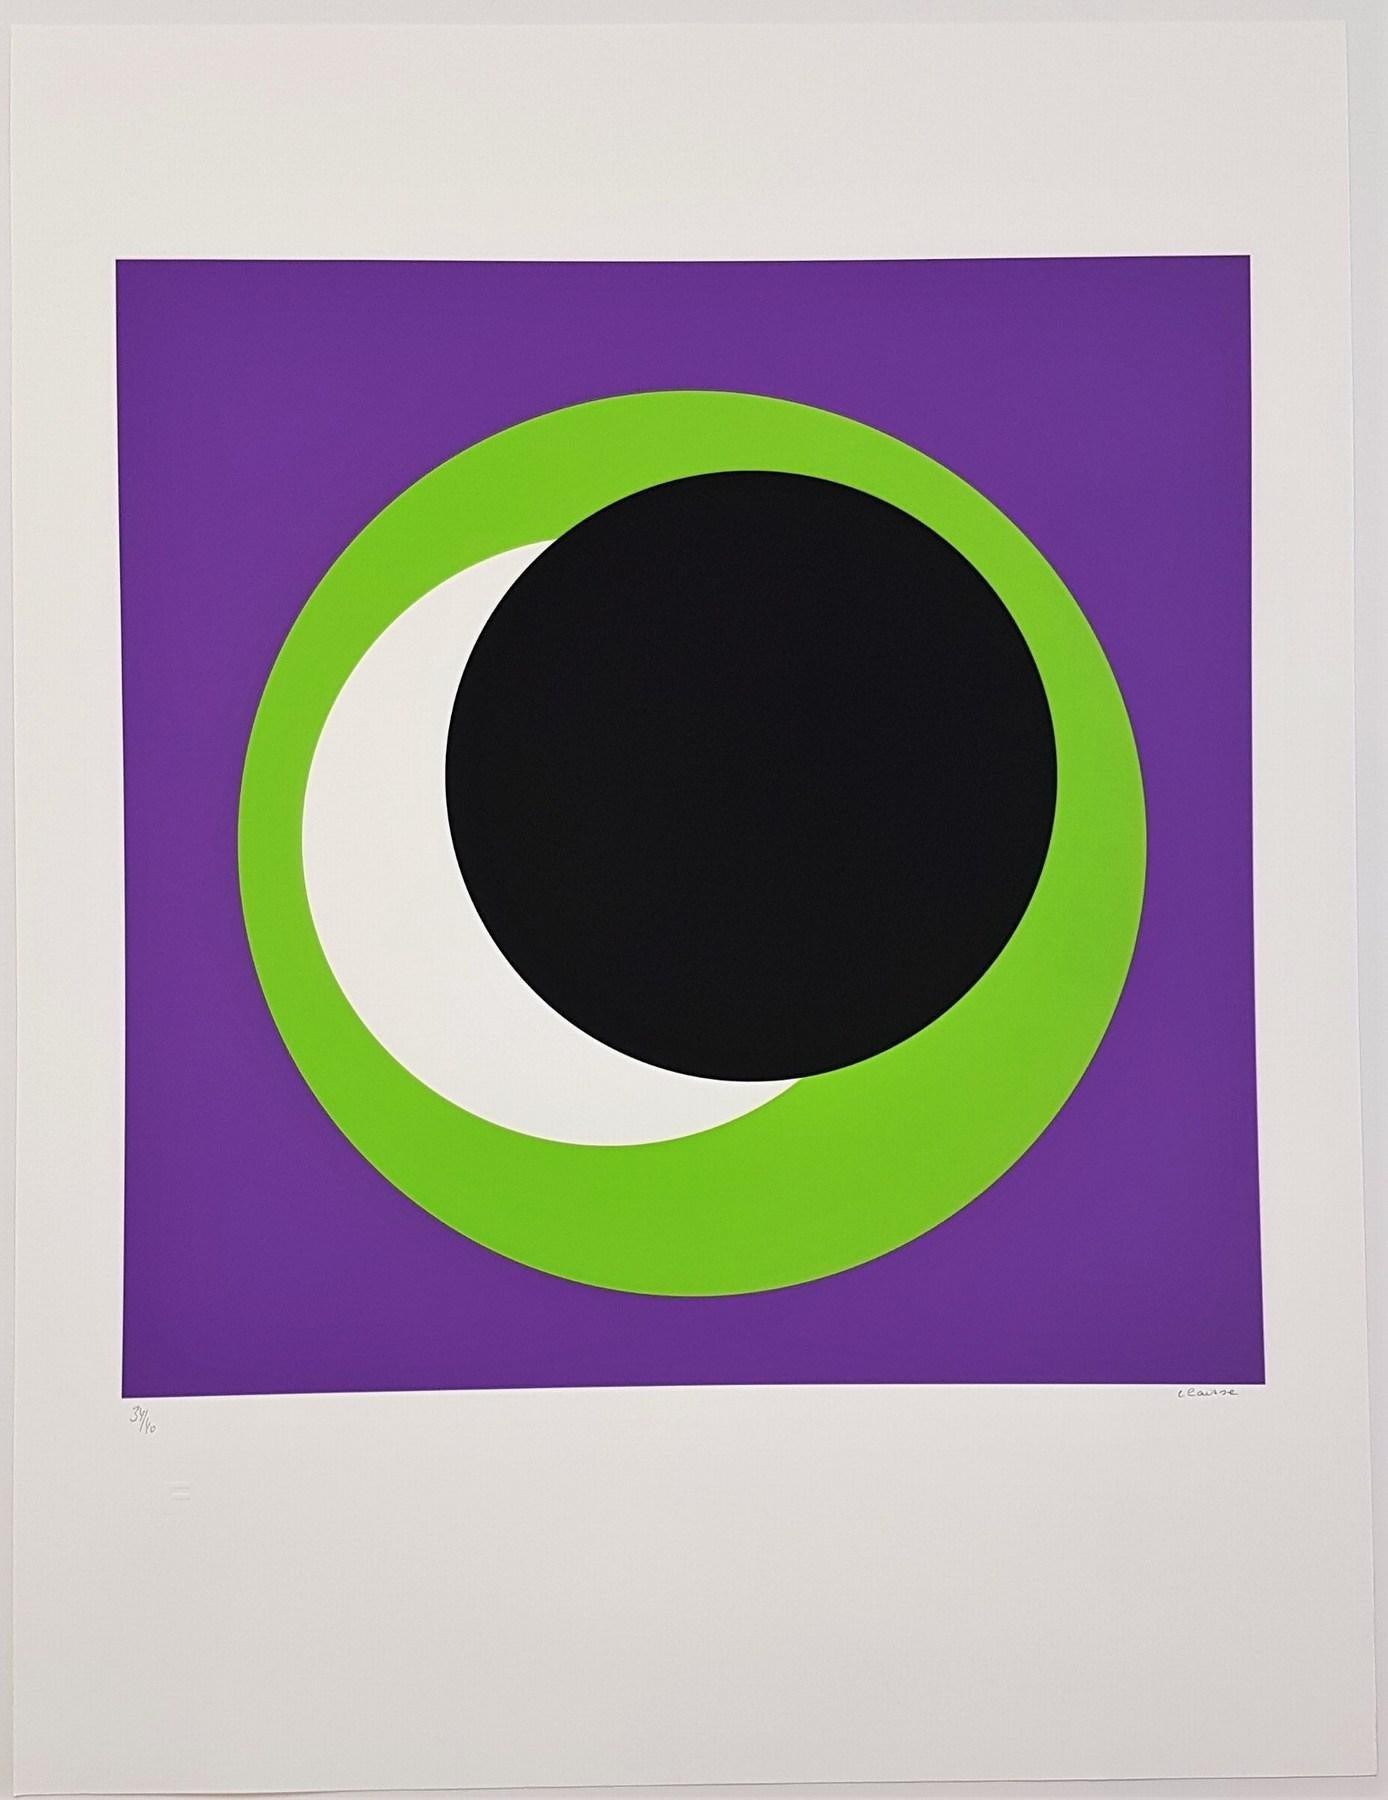 Black and Green Circle (Cercle noir/vert)